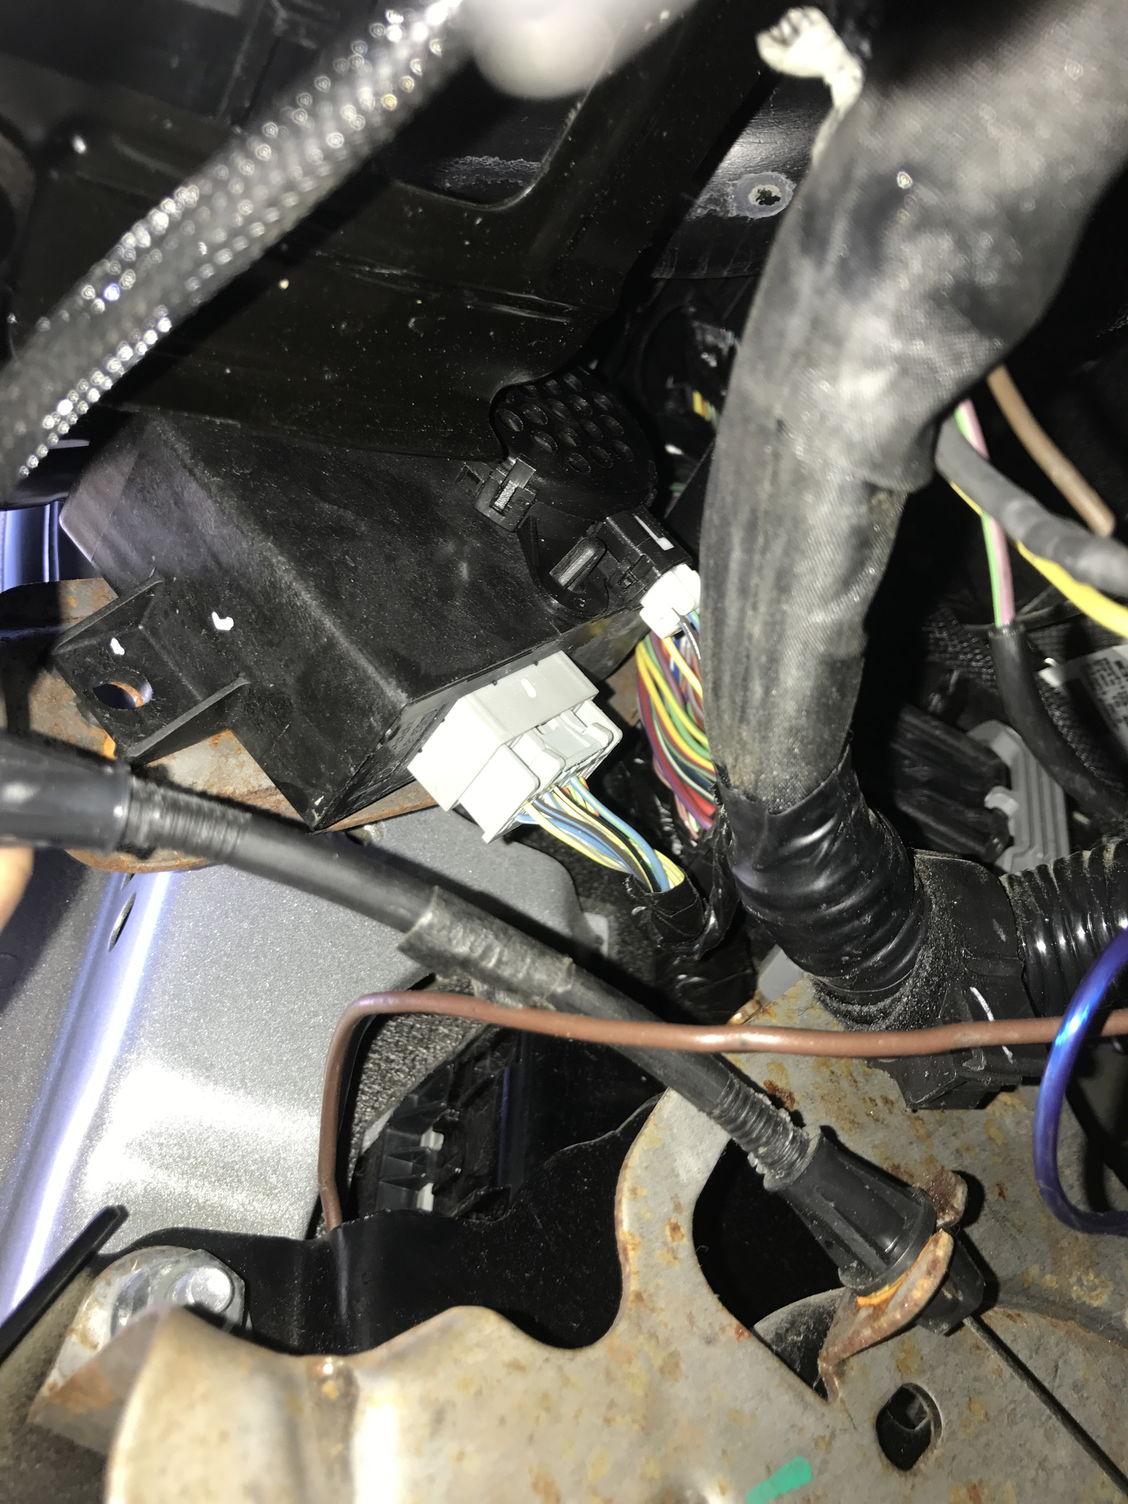 2011 F350 Rear Parking Sensor Problems